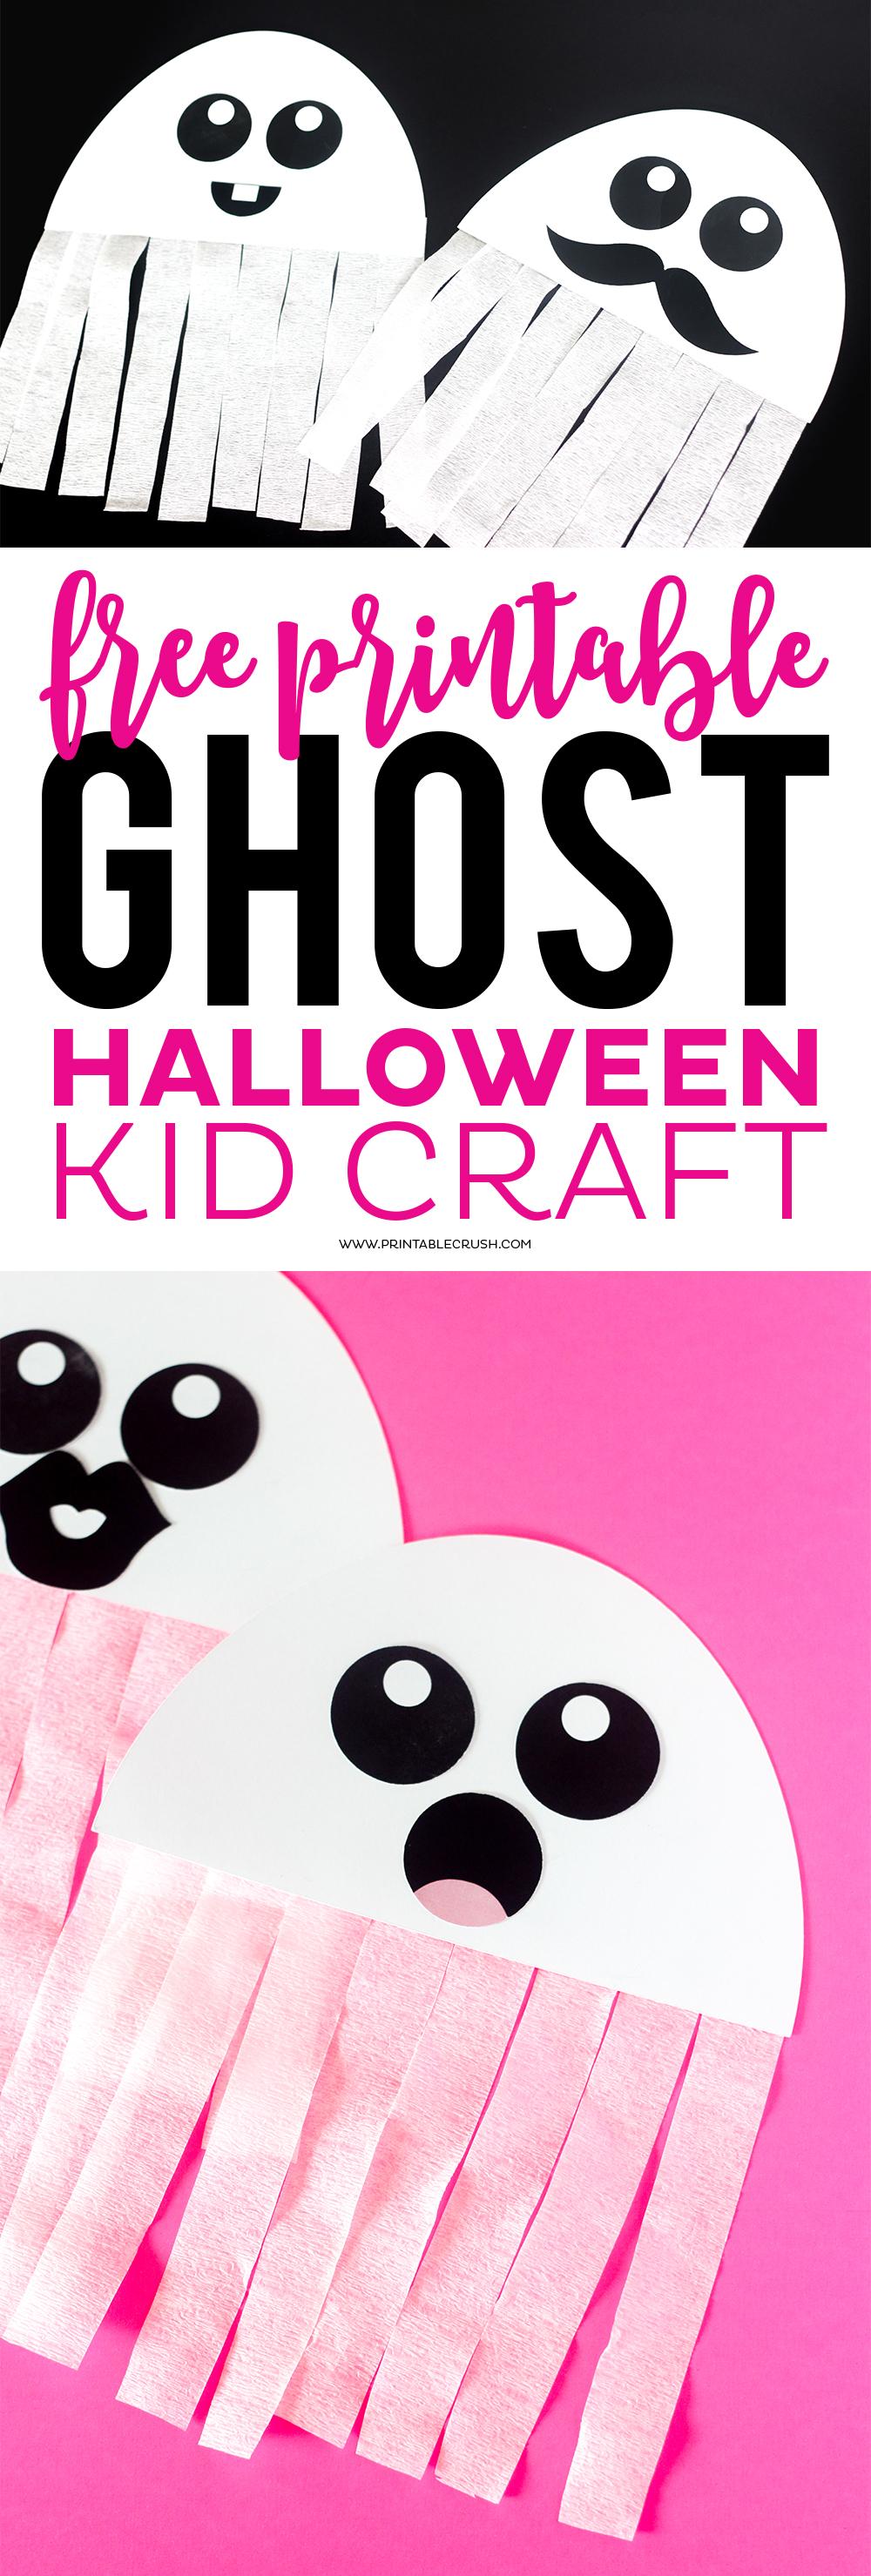 photo relating to Halloween Craft Printable named Absolutely free Printable Ghost Halloween Craft - Printable Crush